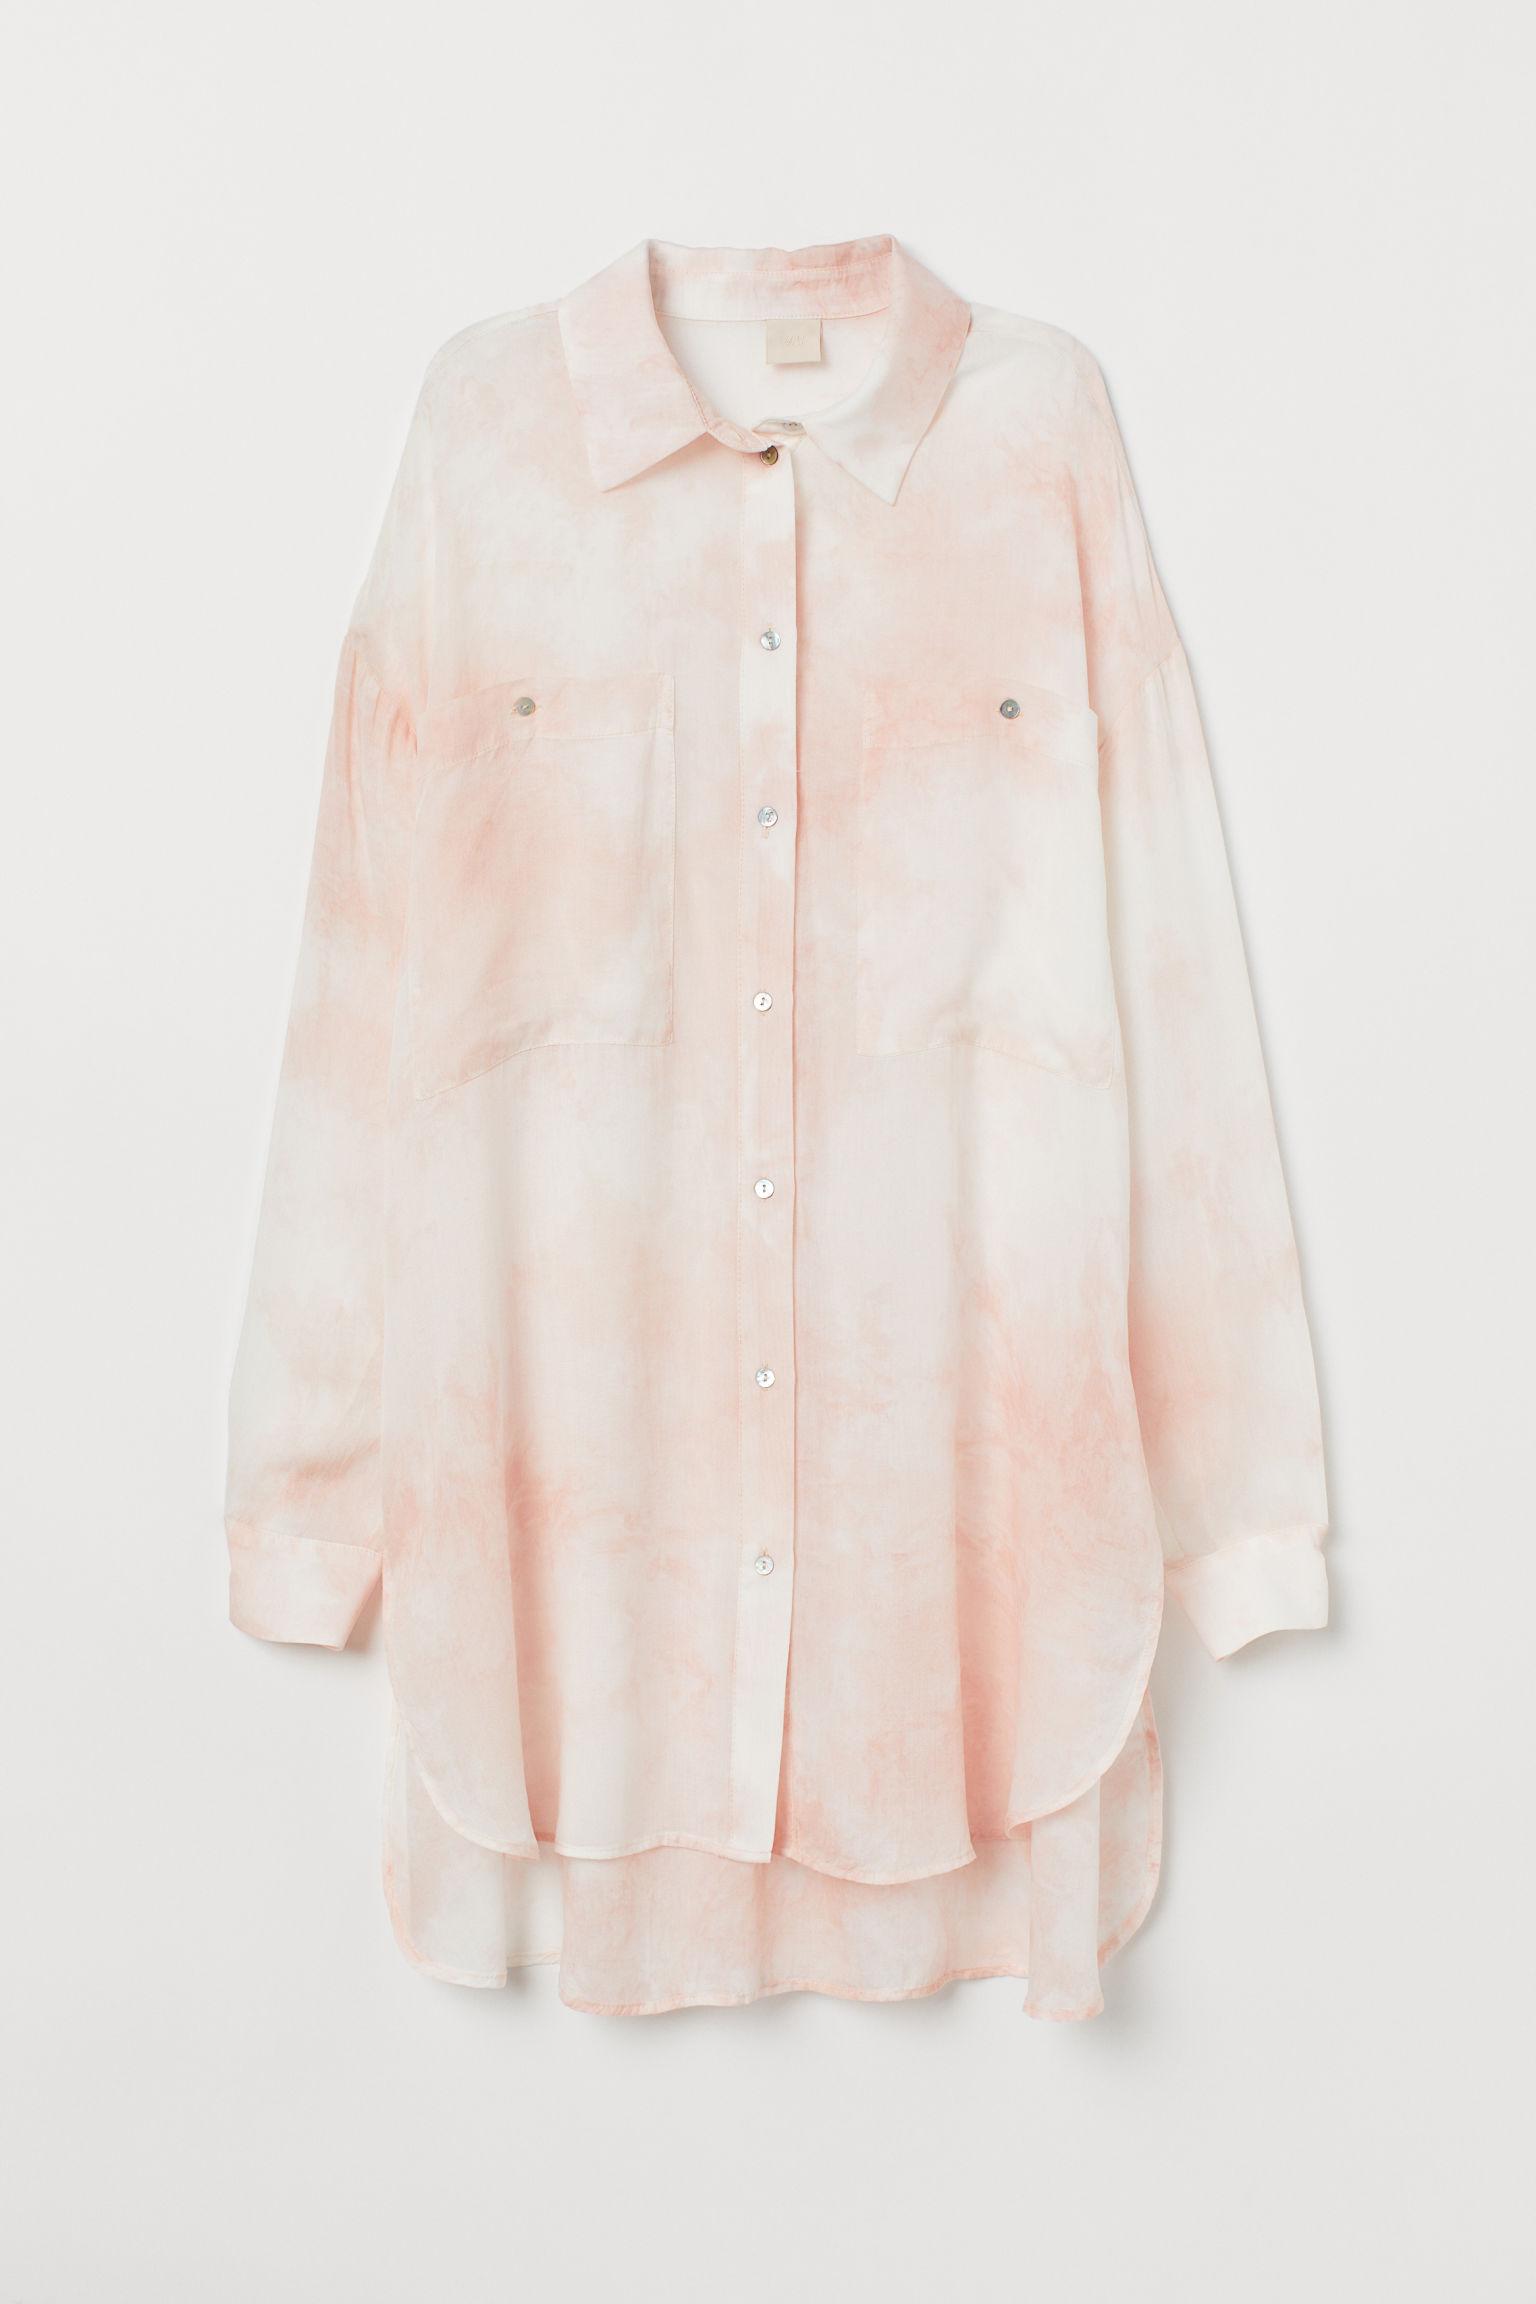 744fda0e280c03 Oversized Shirt - Light pink/batik - Ladies | H&M US